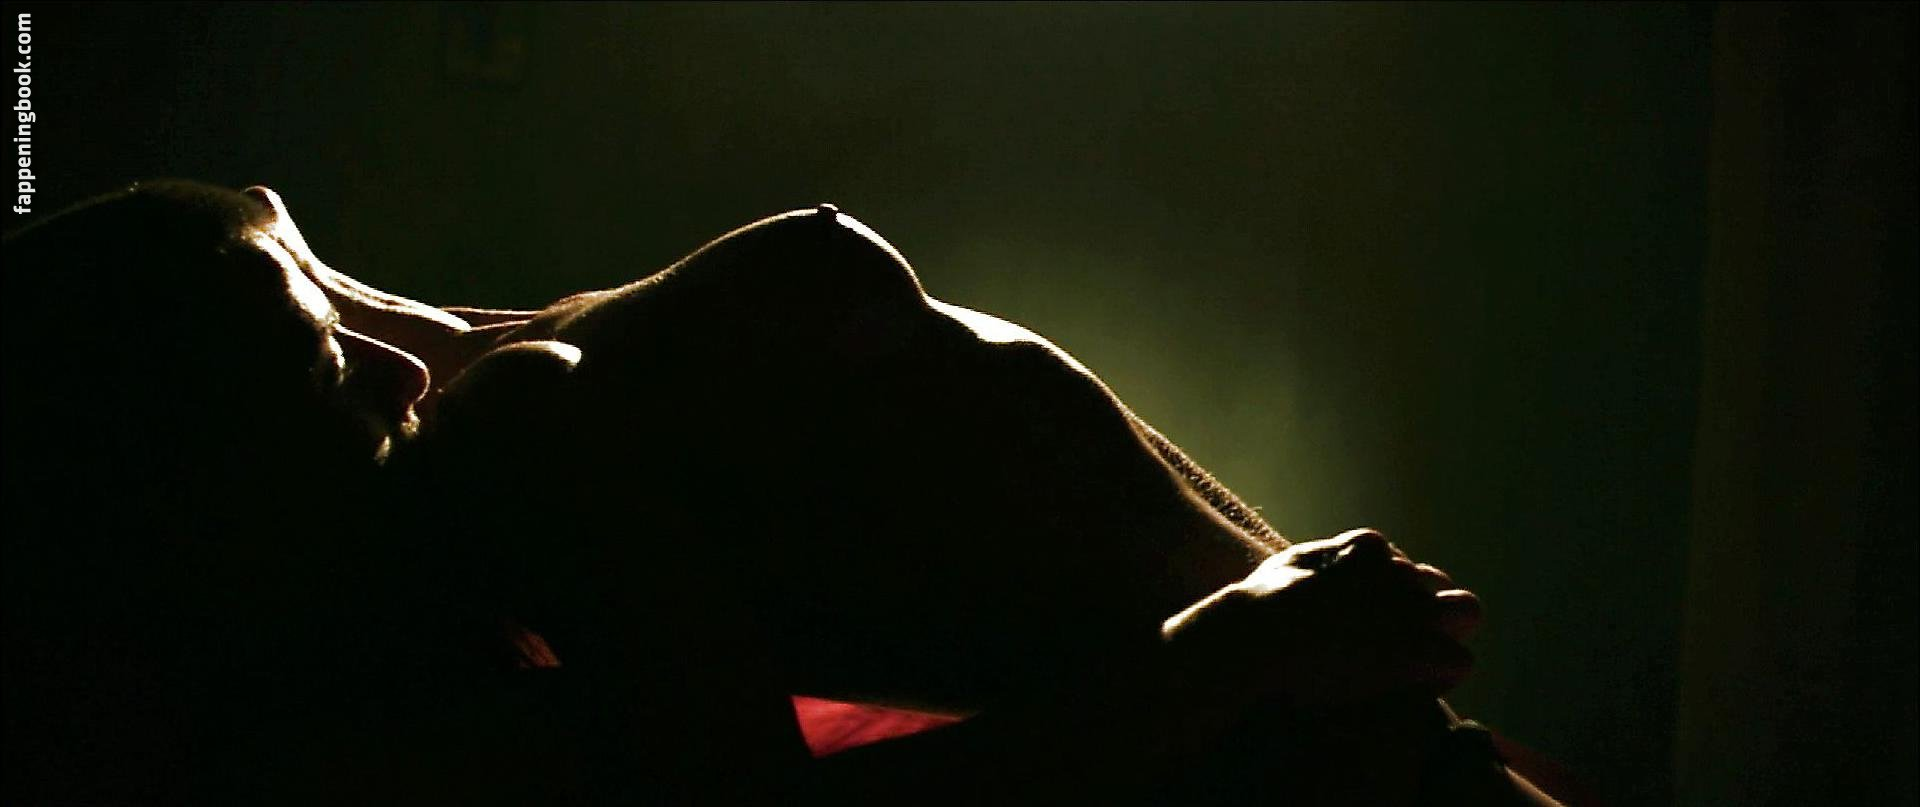 Ana Maljevic Nude ana maljević nude, sexy, the fappening, uncensored - photo